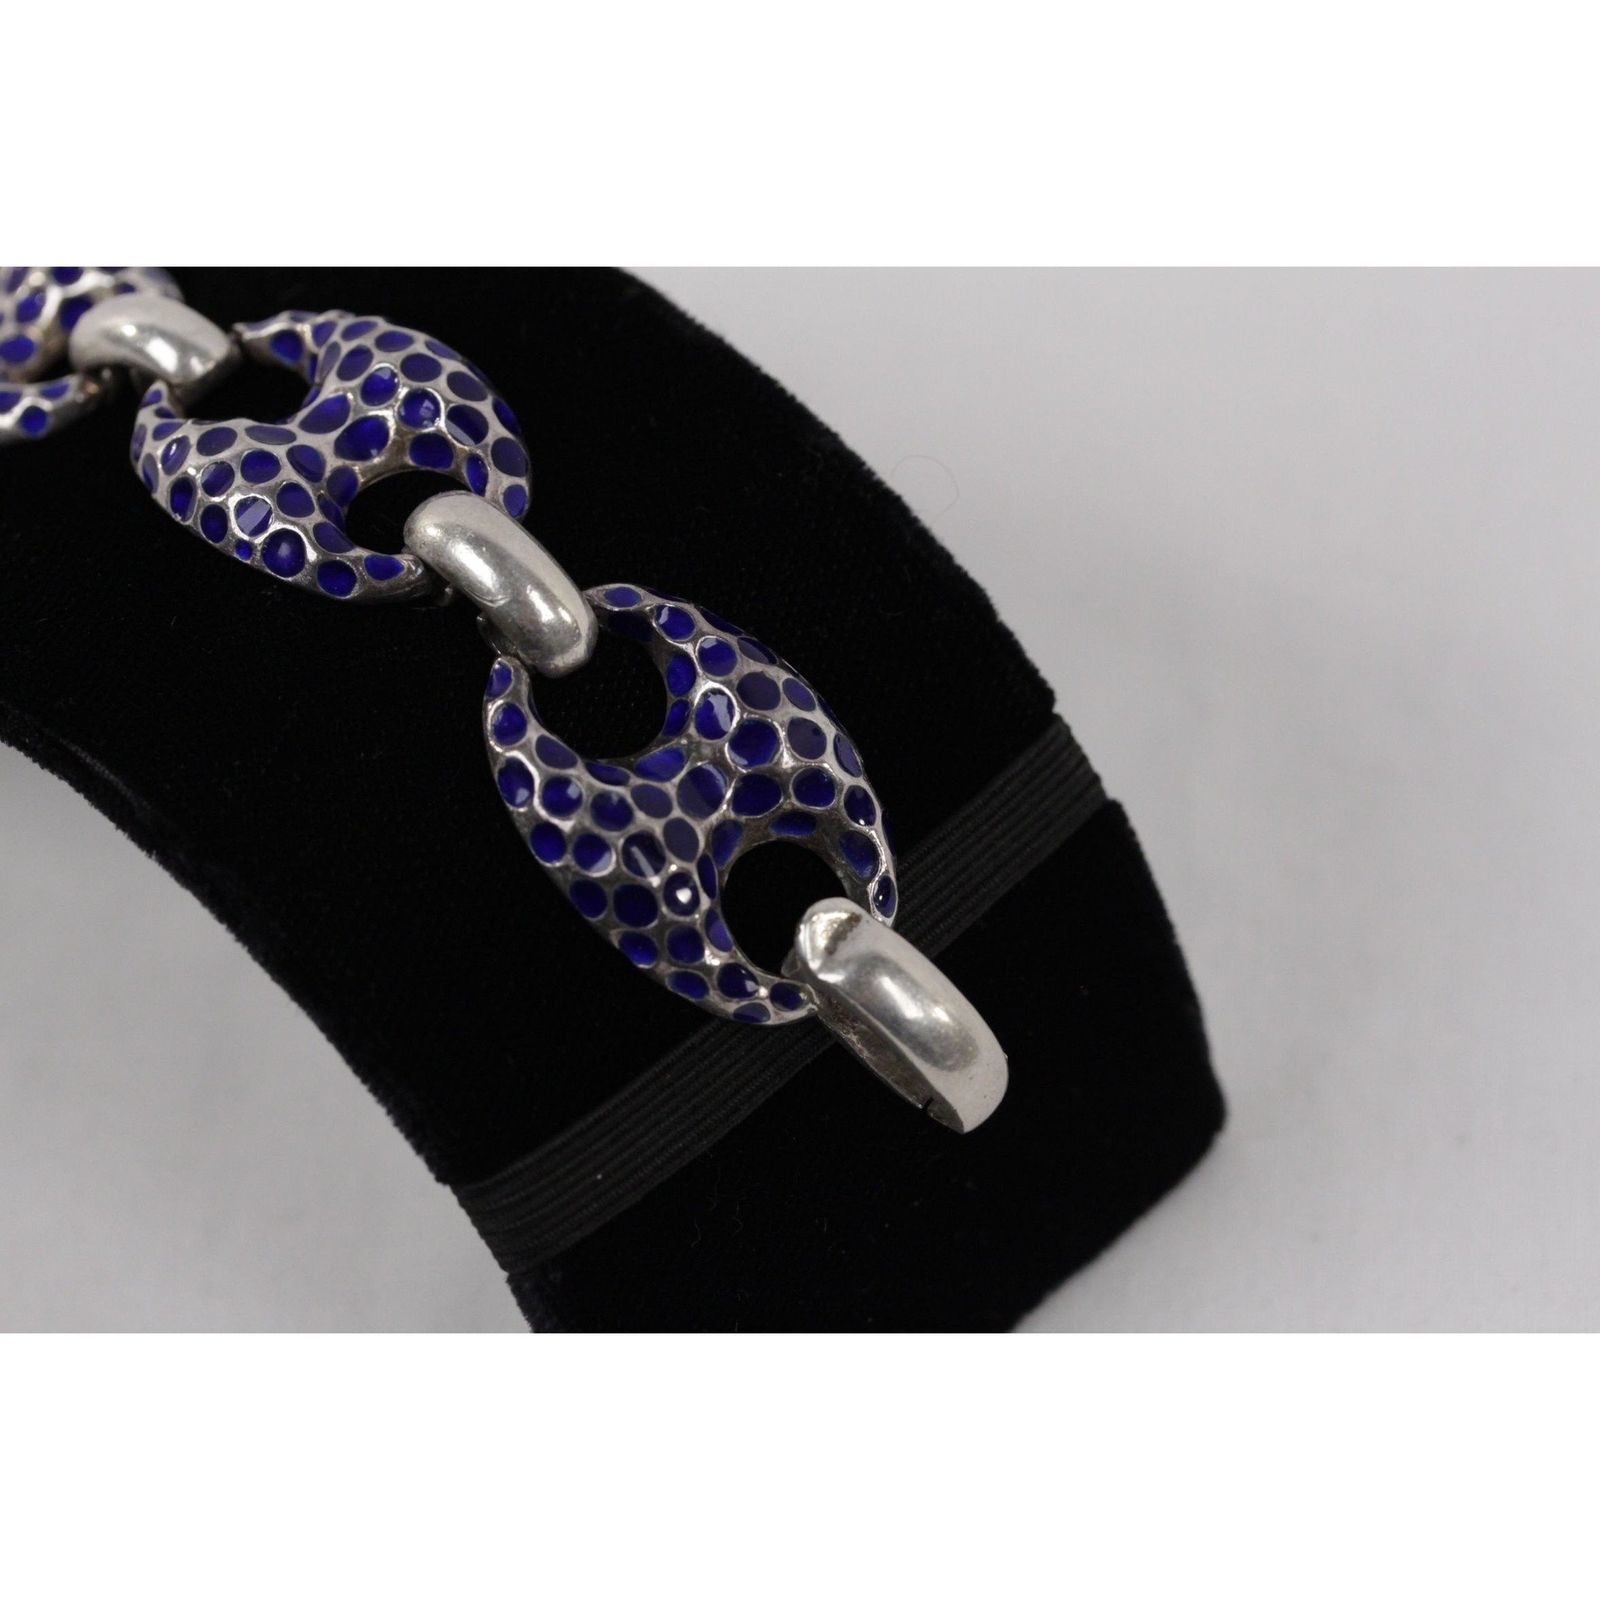 Authentic VINTAGE Tested Sterling Silver Anchor Link Chain Bracelet Blue Enamel